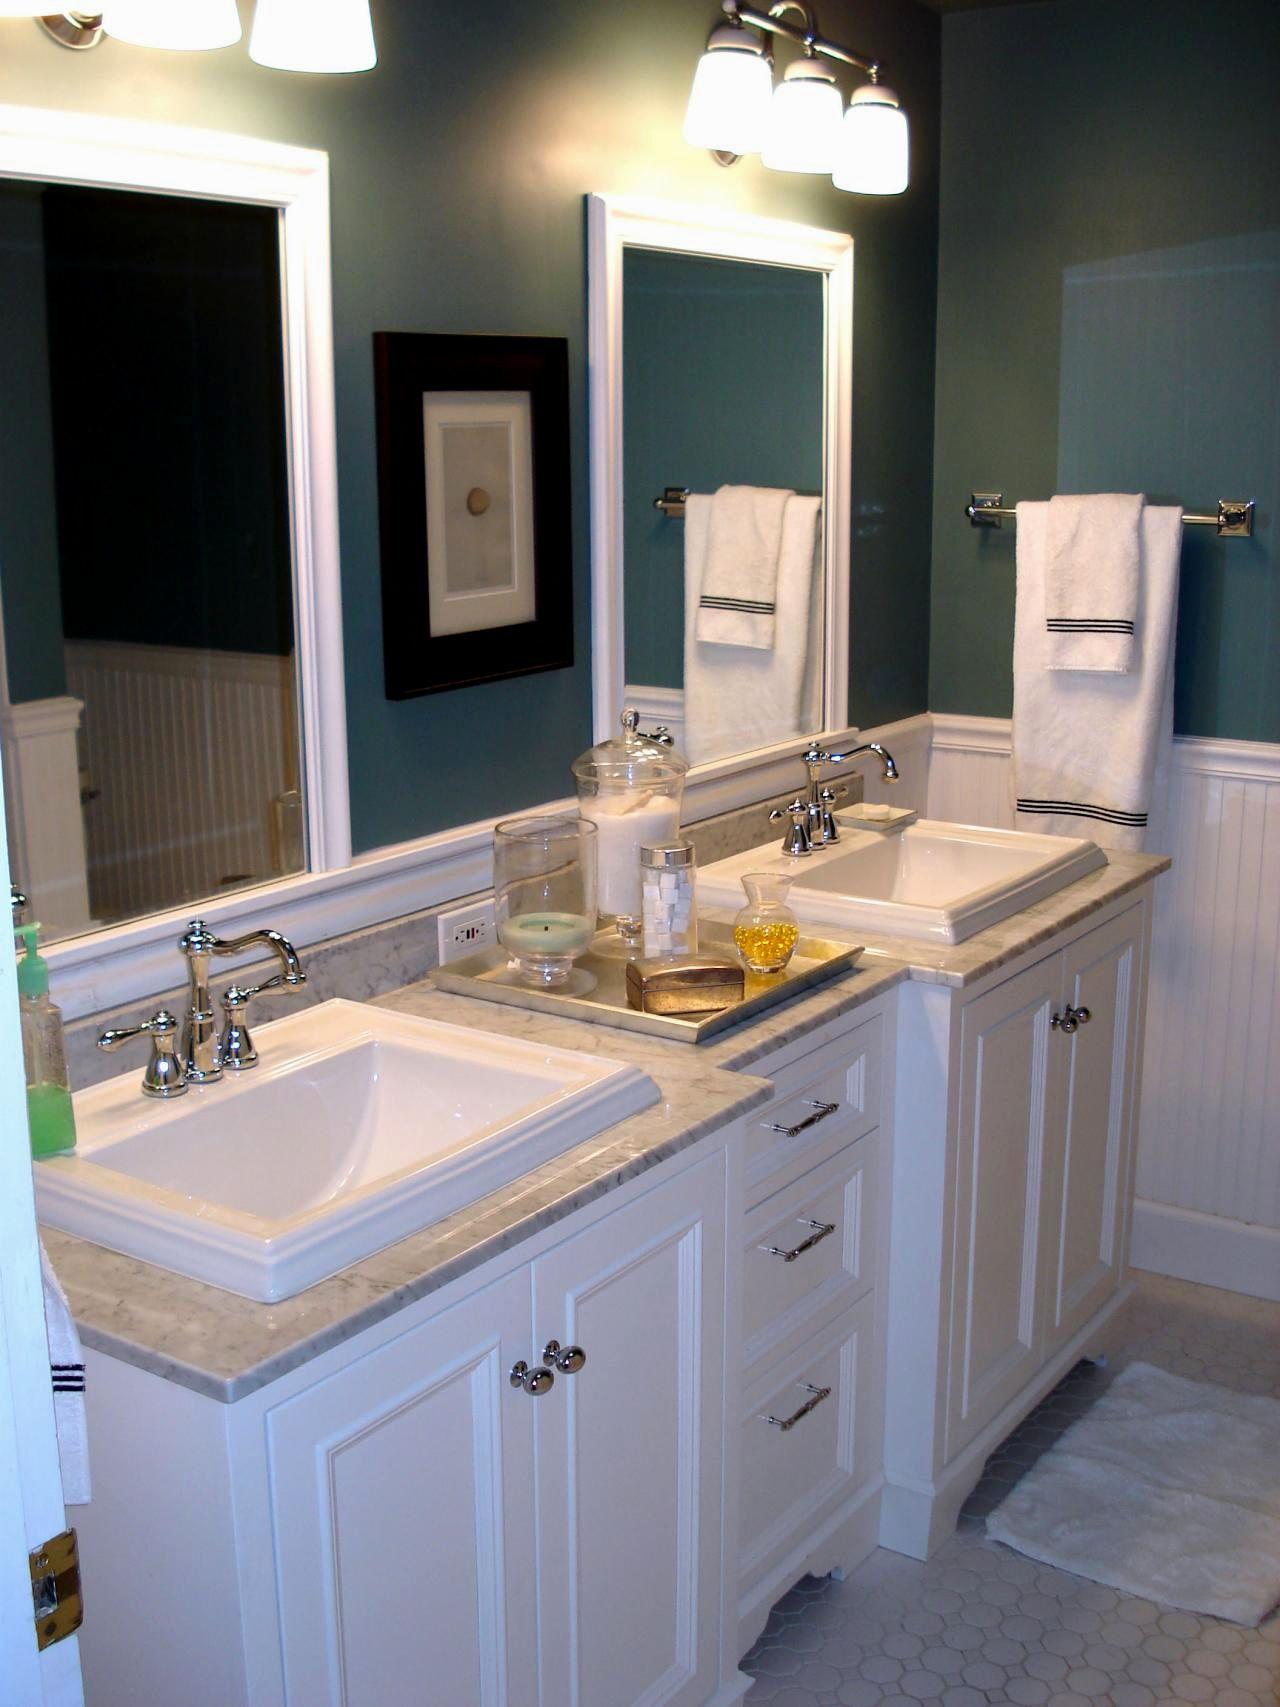 top large bathroom cabinets online-Unique Large Bathroom Cabinets Construction